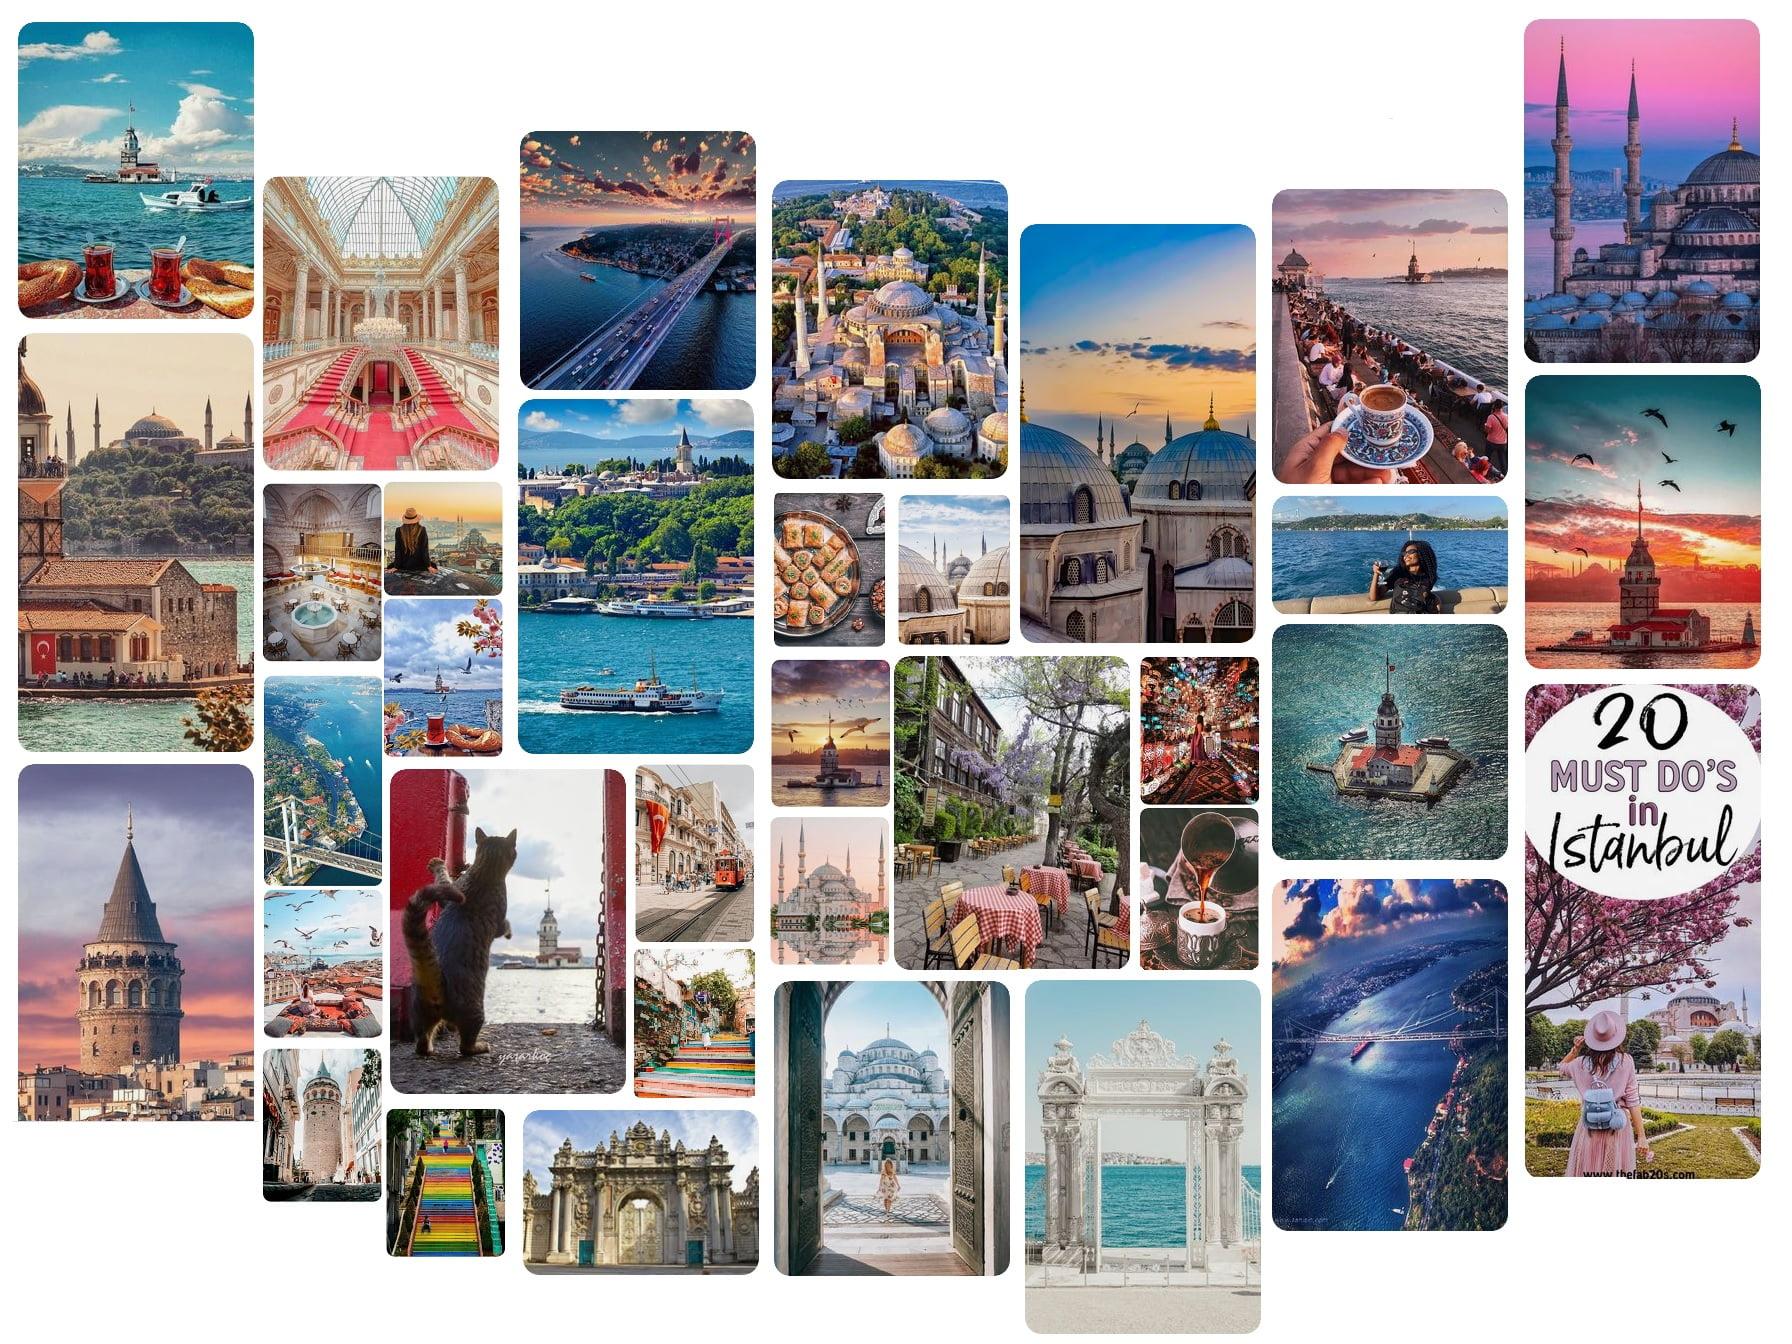 private istanbul guide ana sayfa resim